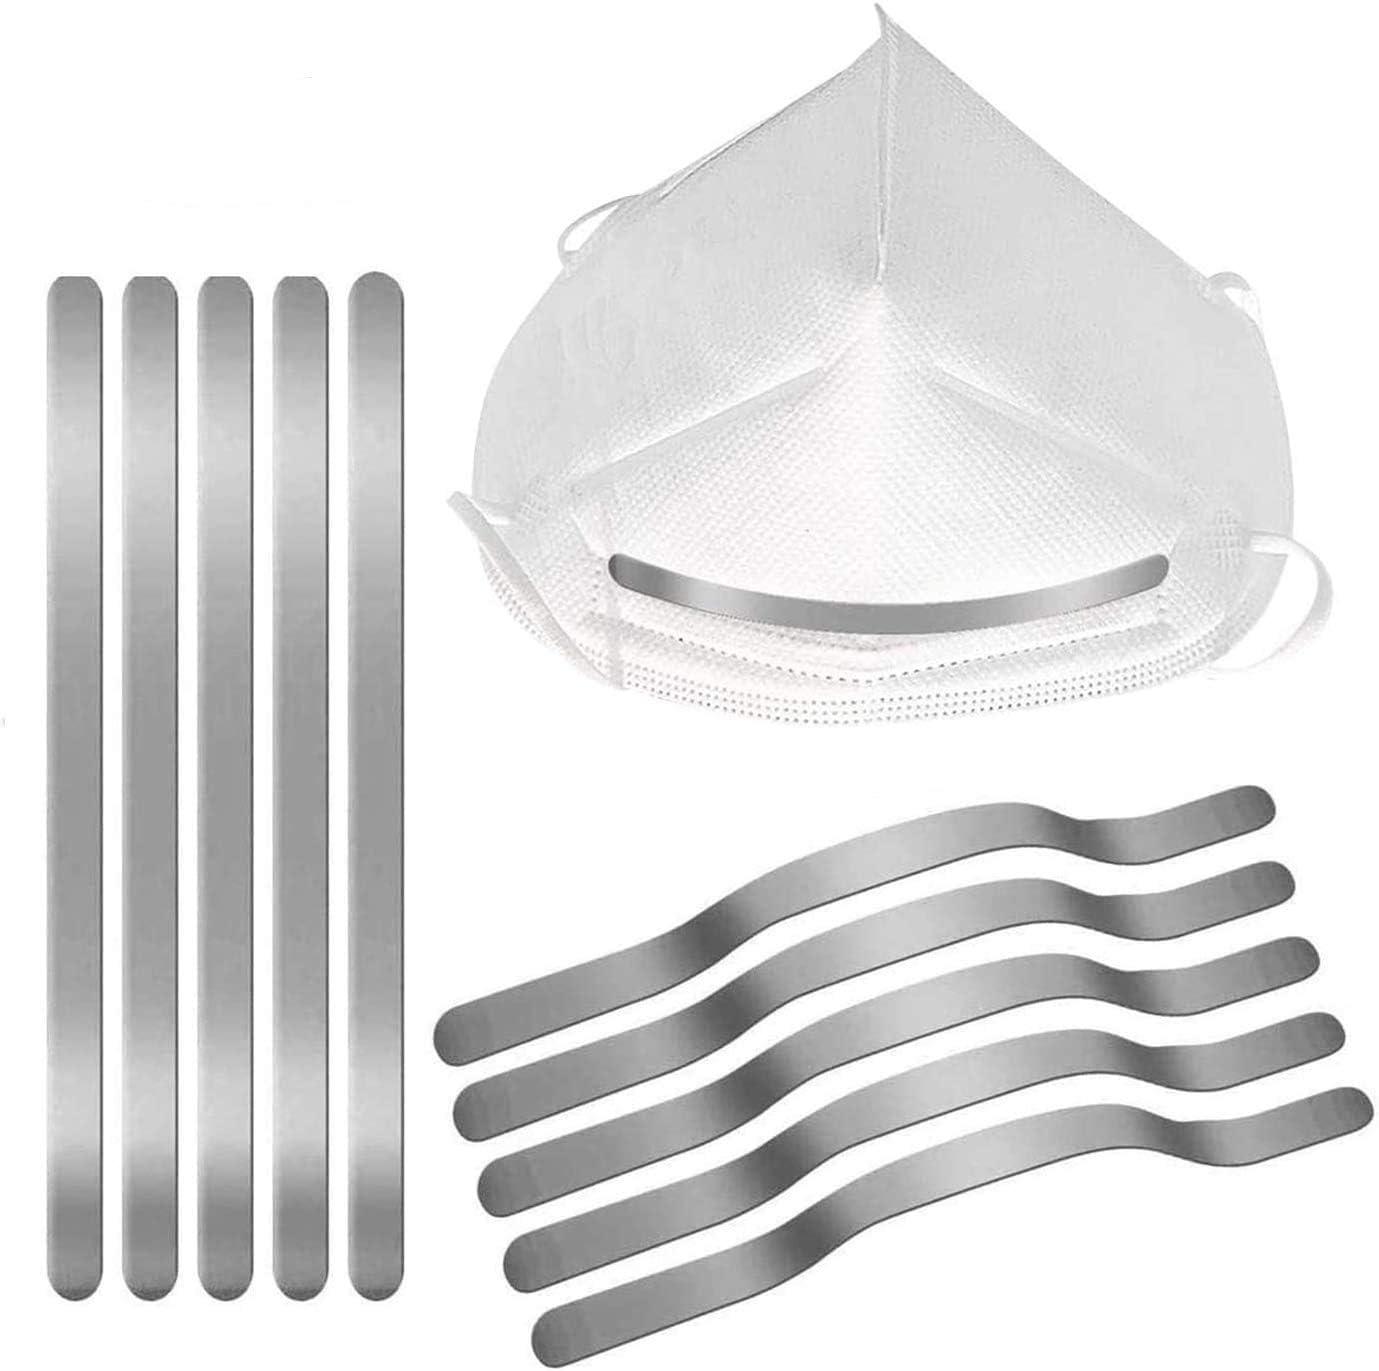 50Pcs Nose Bridge Strips for DIY Mask Metal Aluminum Wire Clips Adhesive